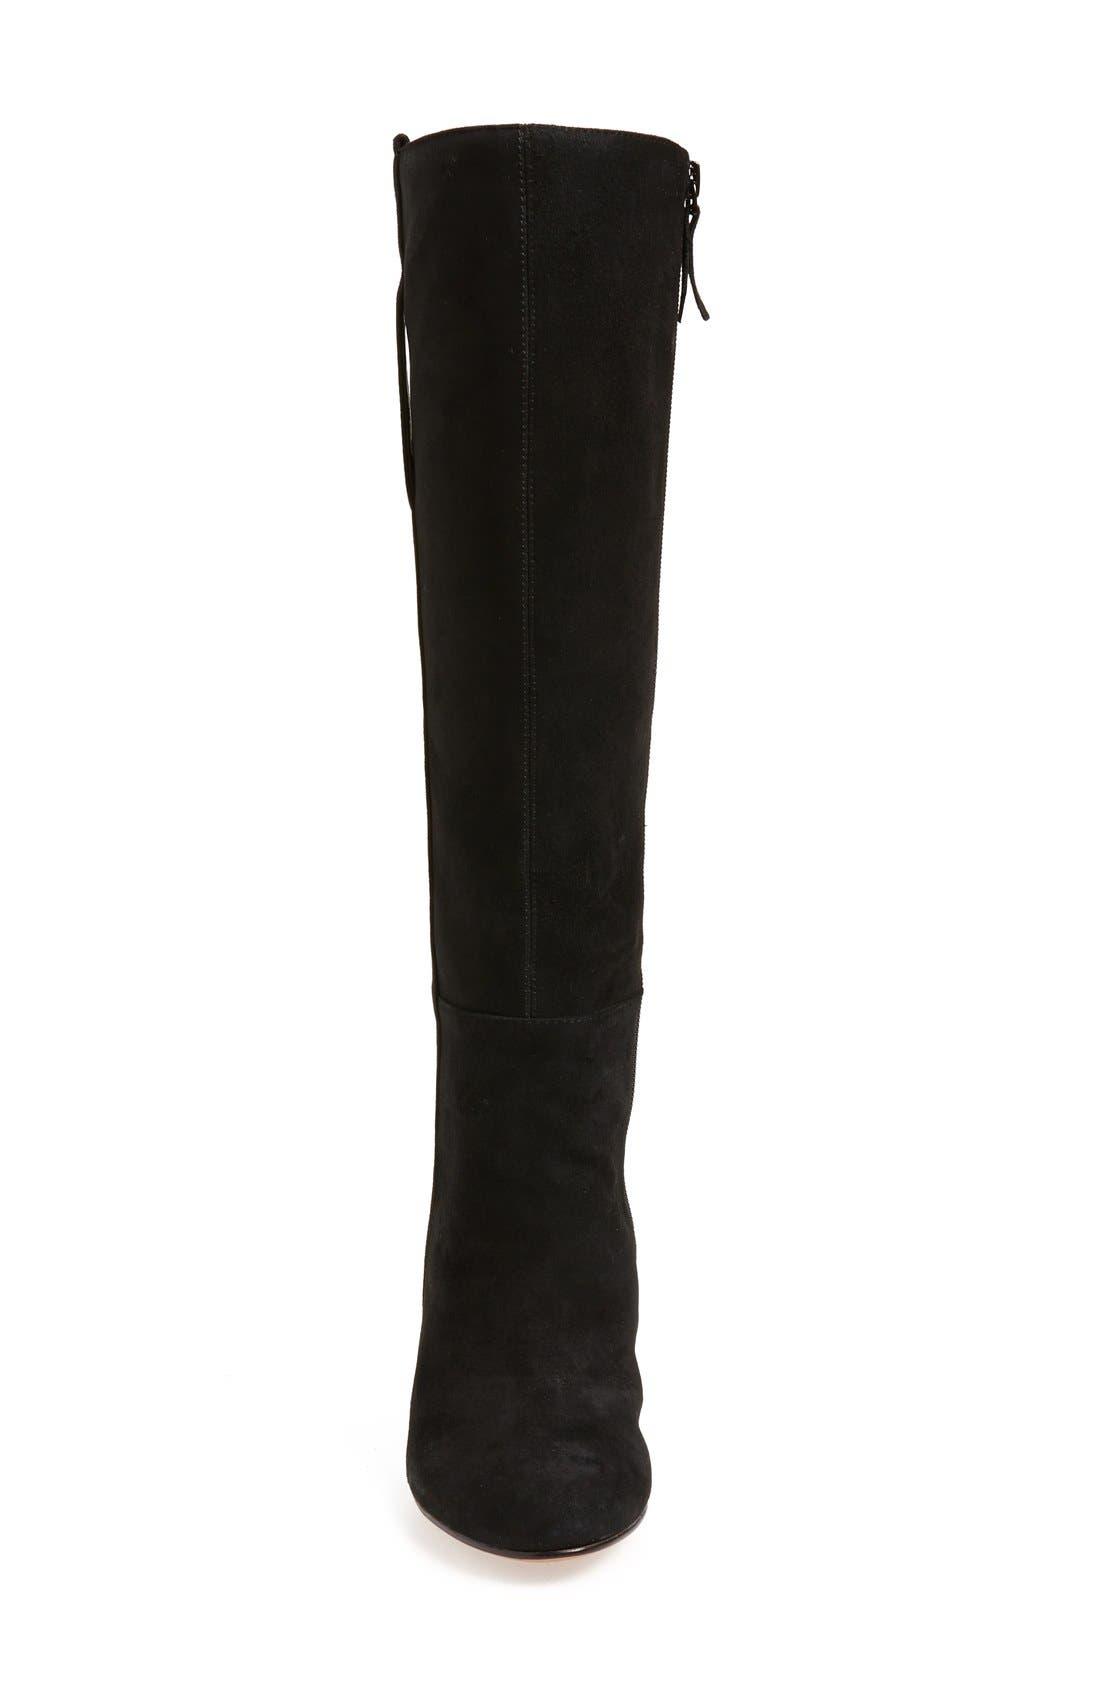 'Oran' Tall Wedge Boot,                             Alternate thumbnail 3, color,                             001